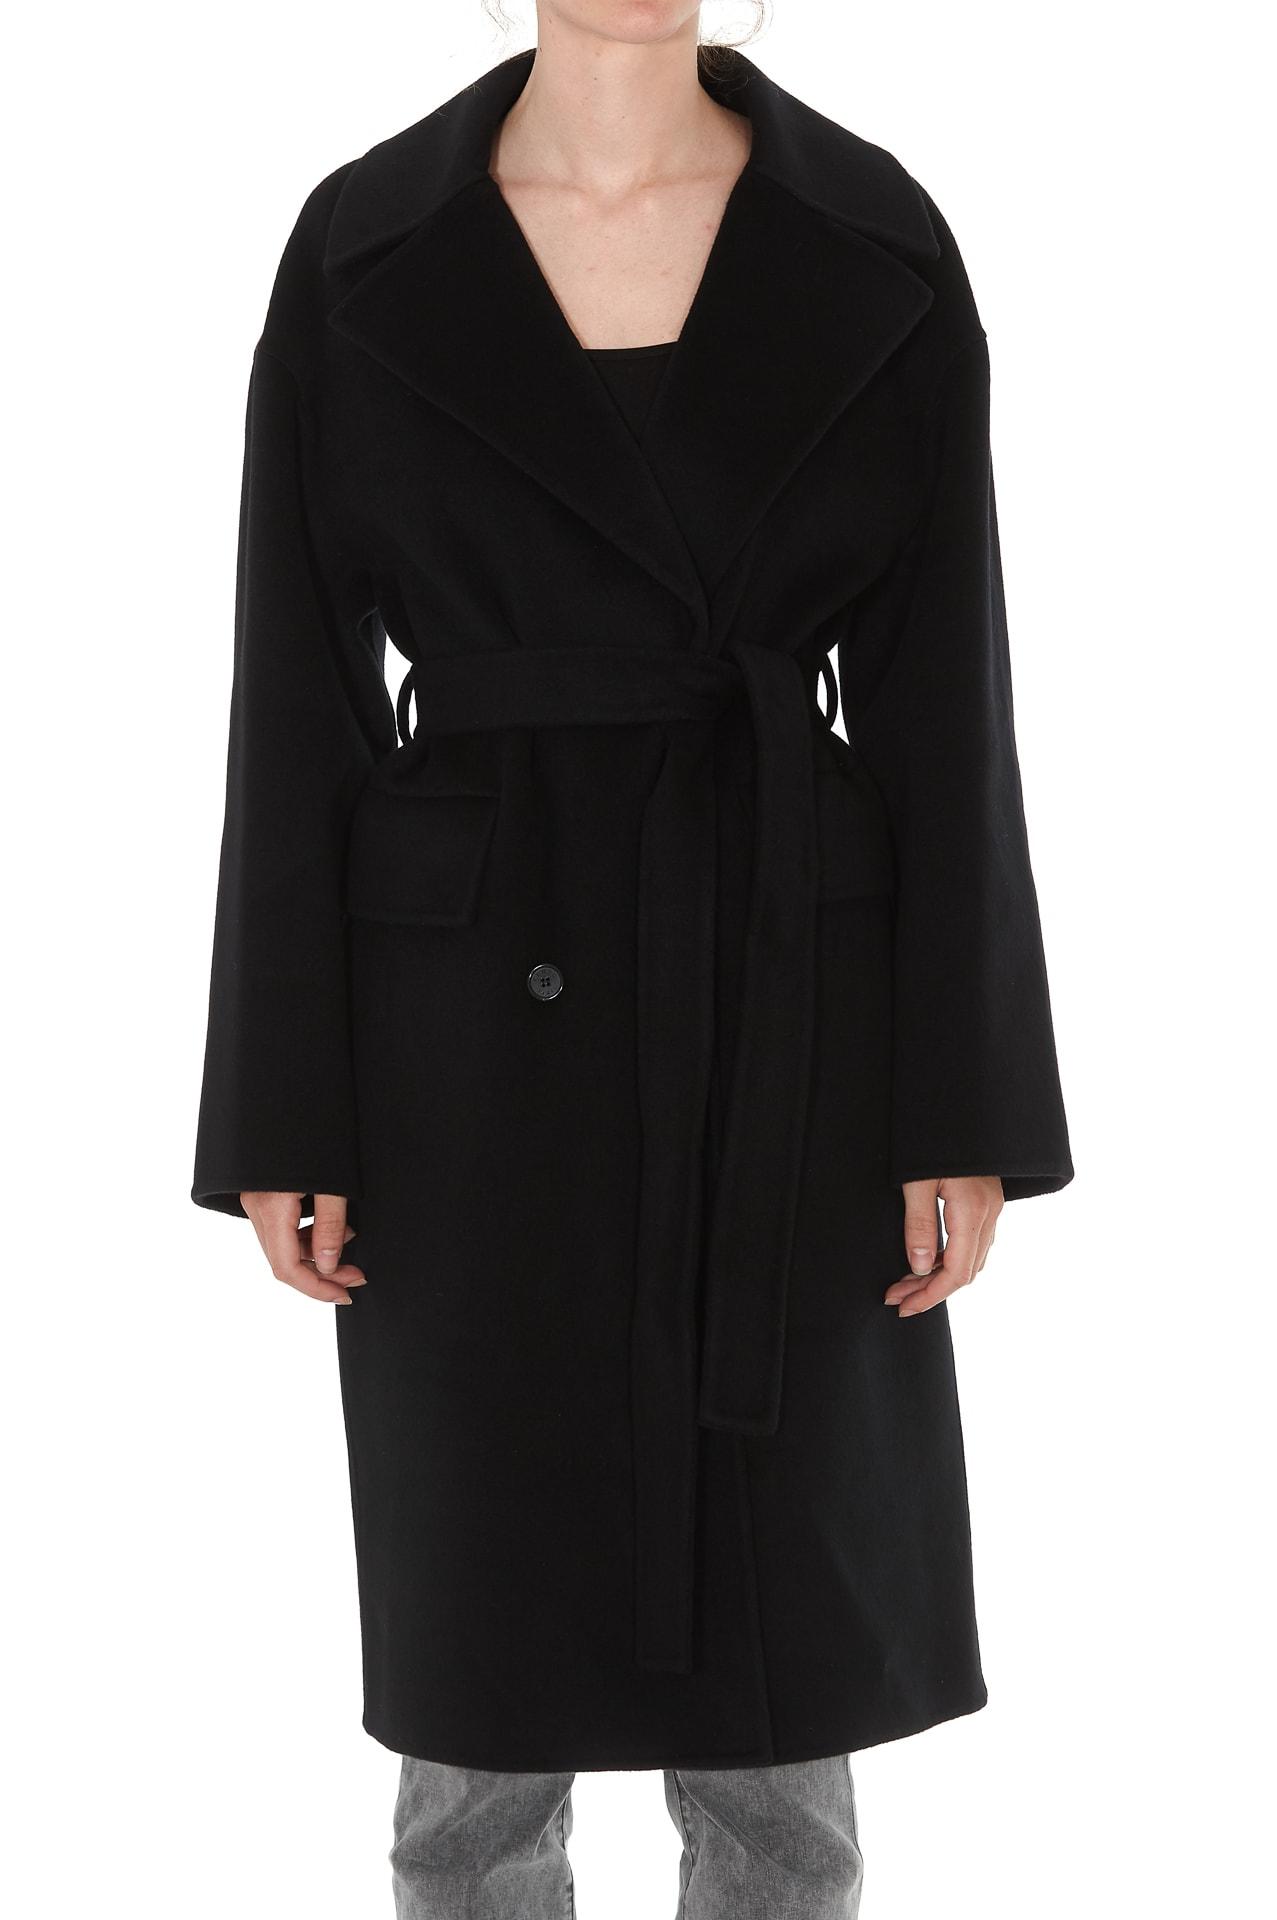 Kenzo Belted Coat